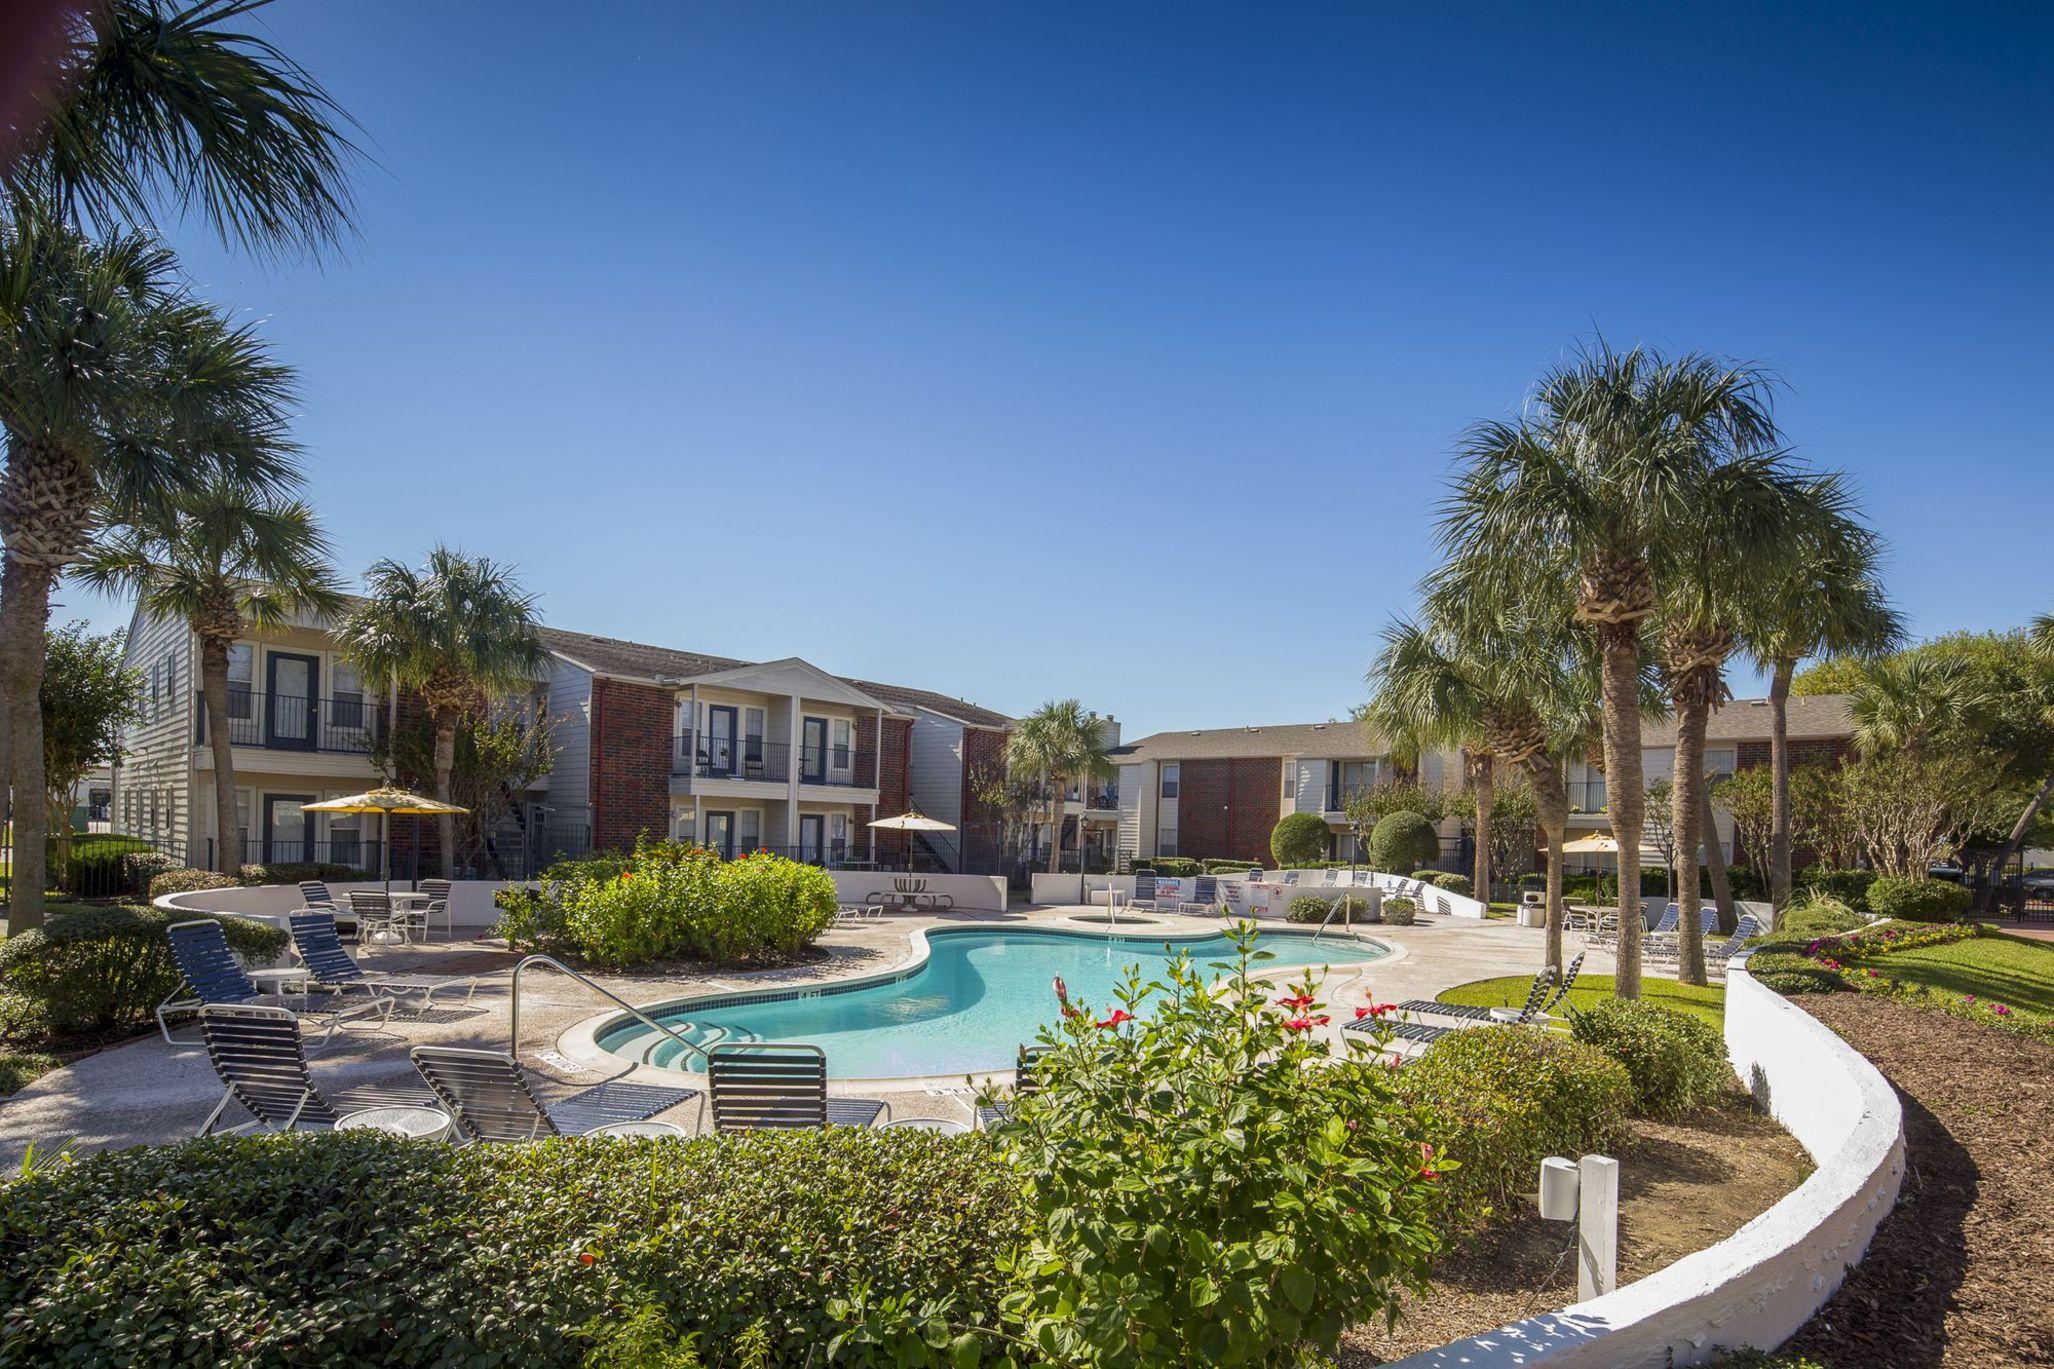 Exterior swimming pool at Stone Ridge apartments